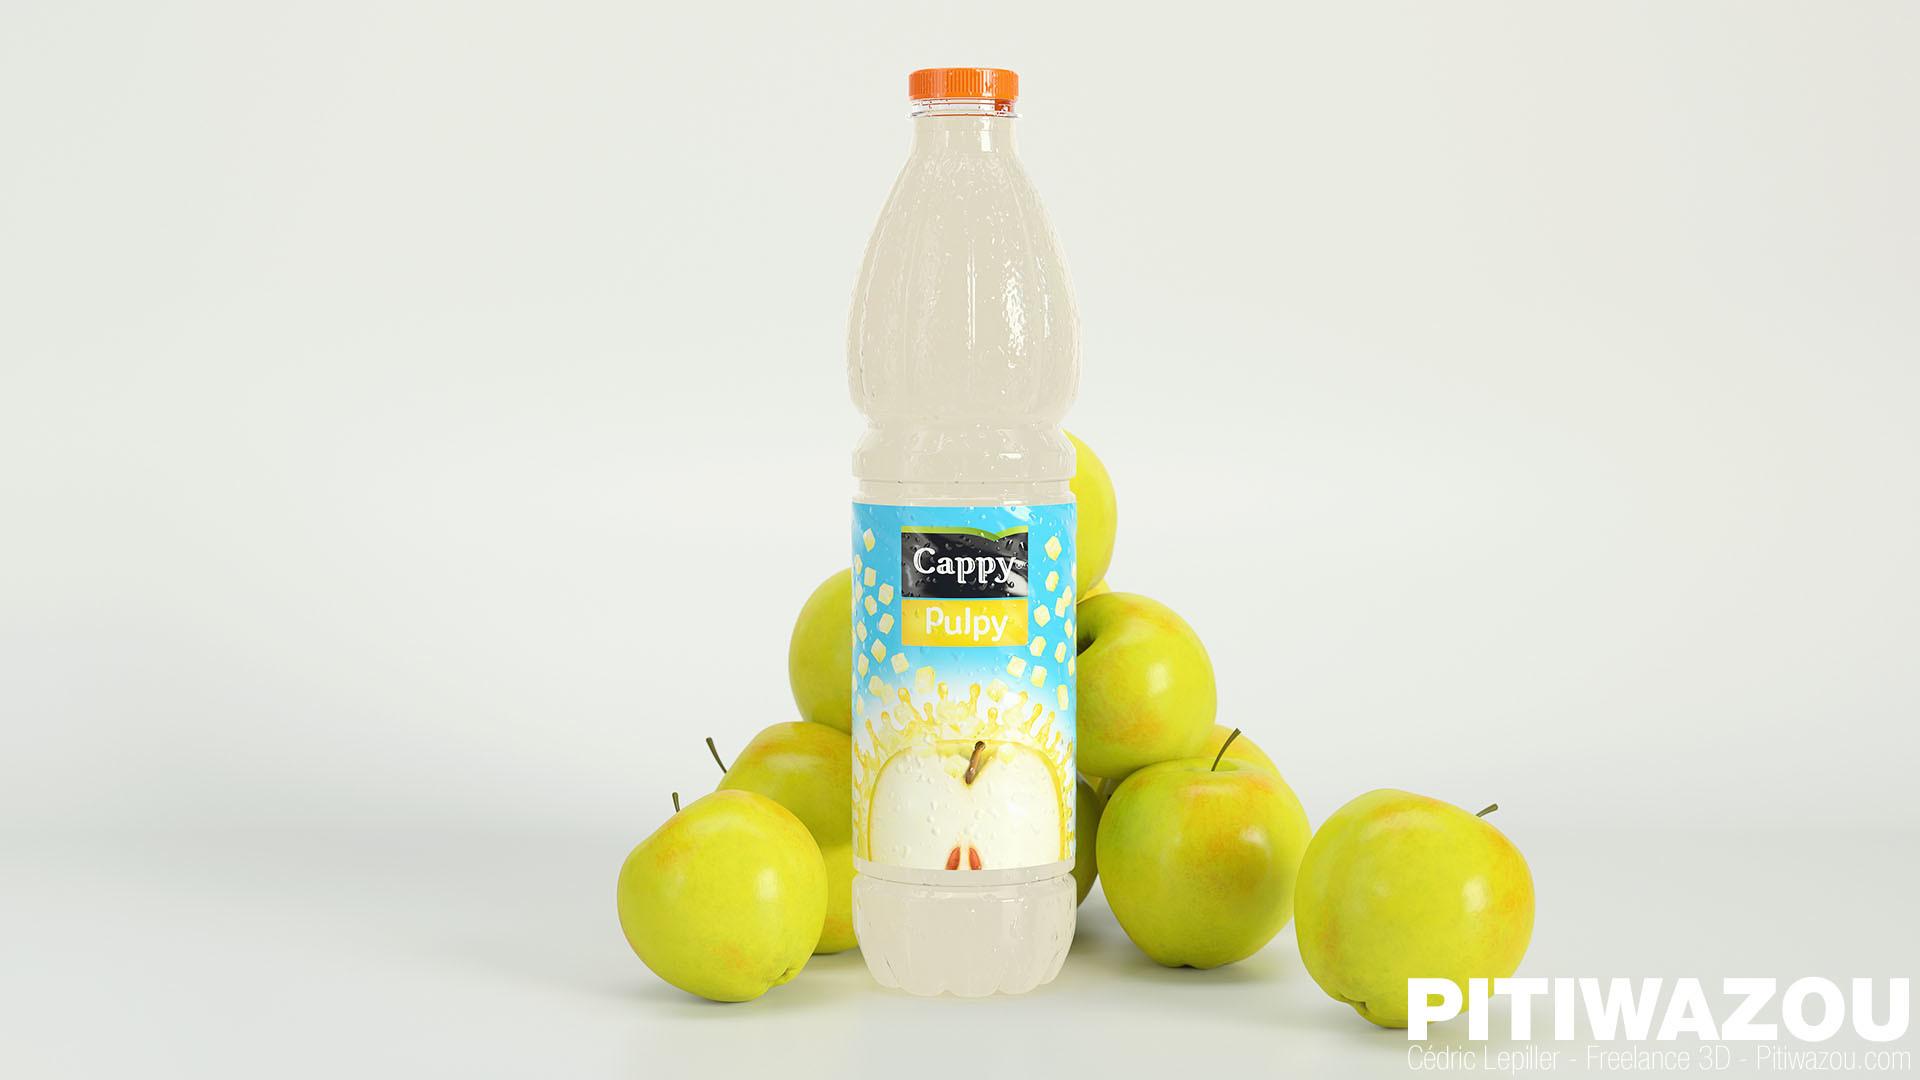 Cedric lepiller cedric lepiller pitiwazou pulpy pomme 001